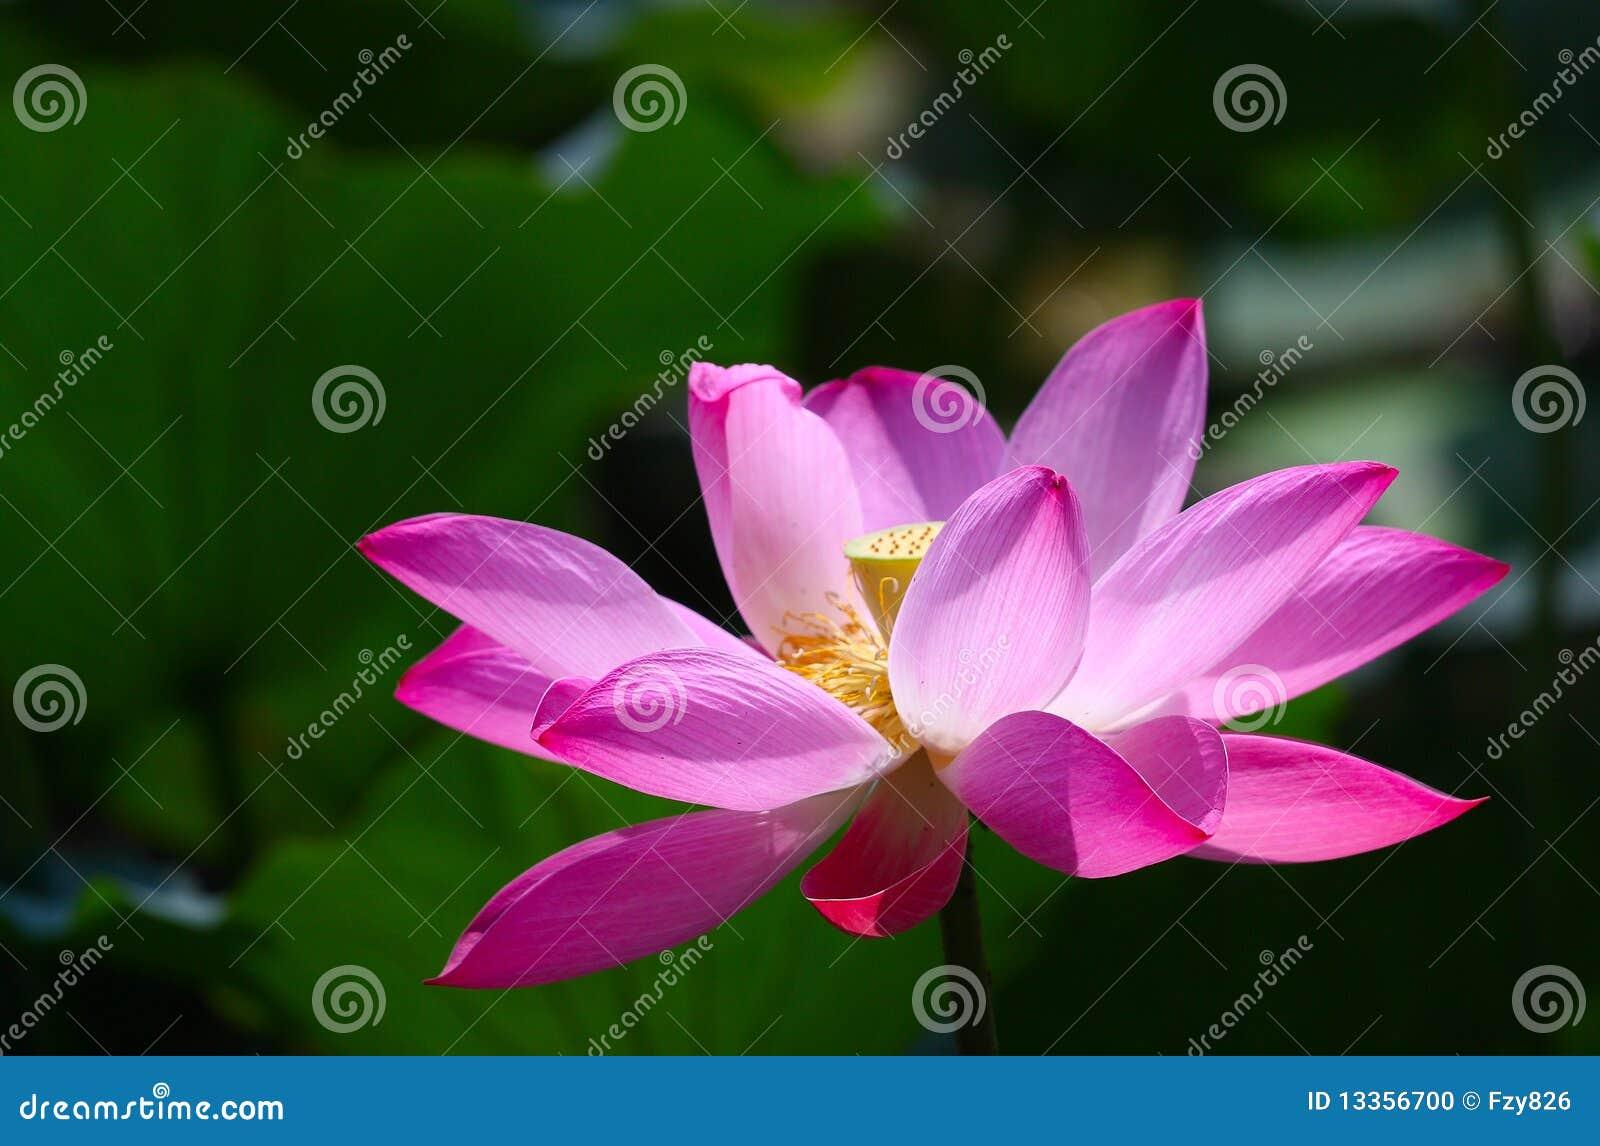 lotus bloom stock photo image 13356700. Black Bedroom Furniture Sets. Home Design Ideas